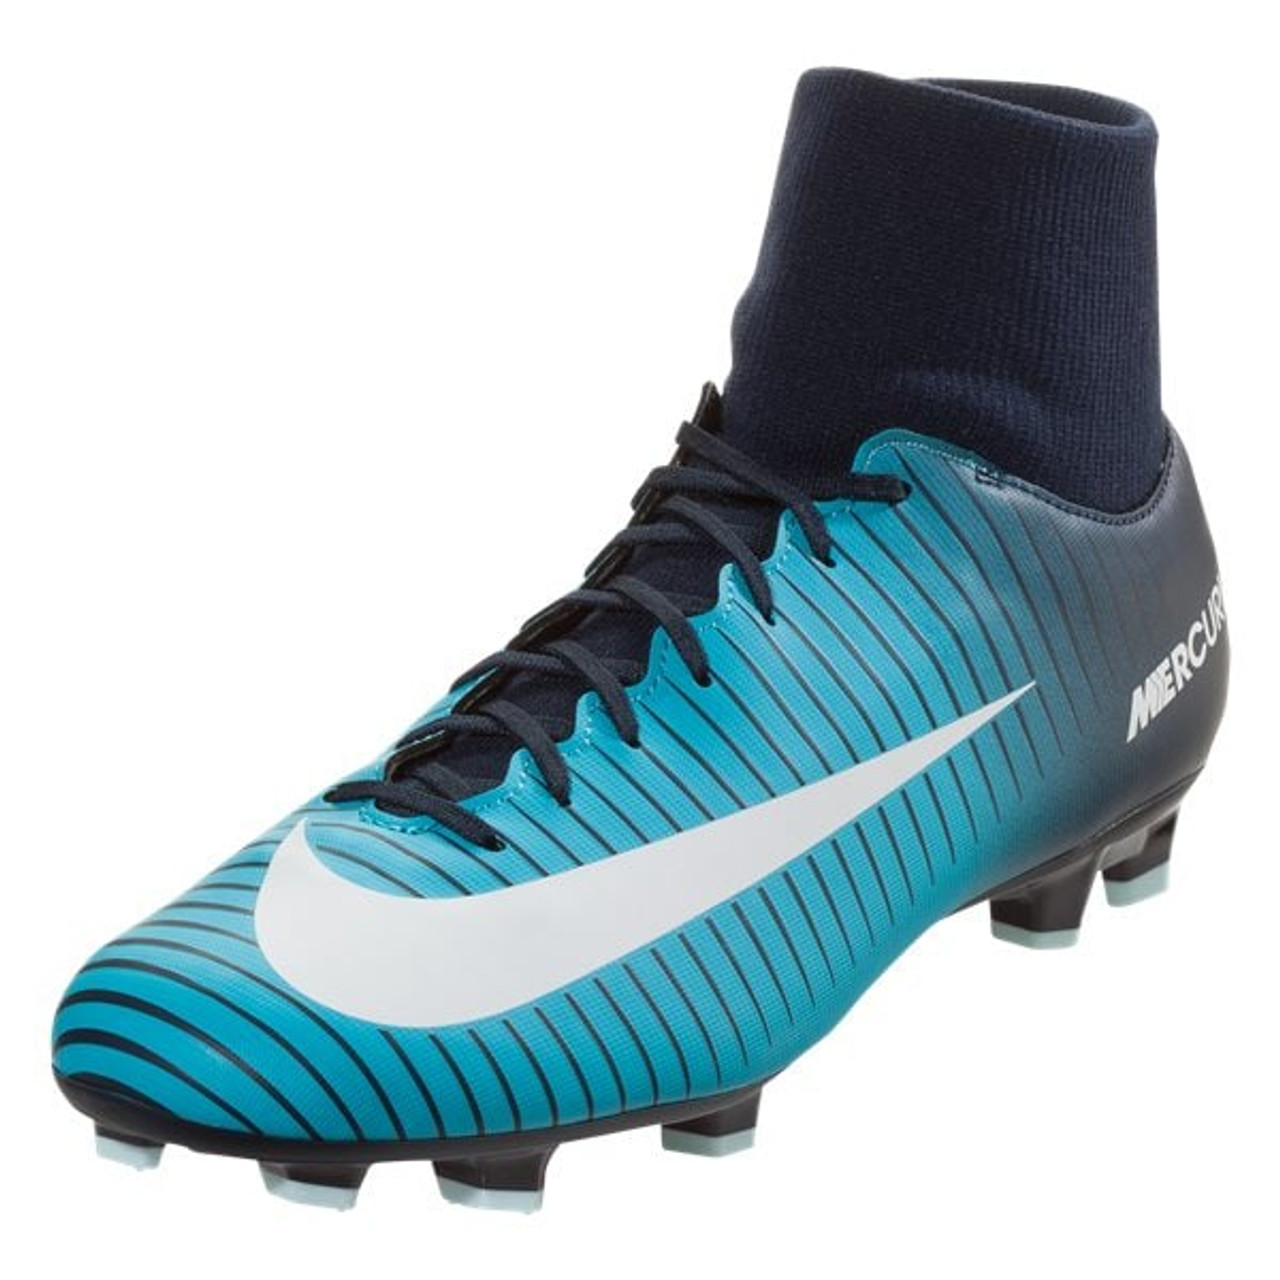 Nike Mercurial Victory VI DF FG - Obsidian  White Gamma Blue (102617) - ohp  soccer a9a157109